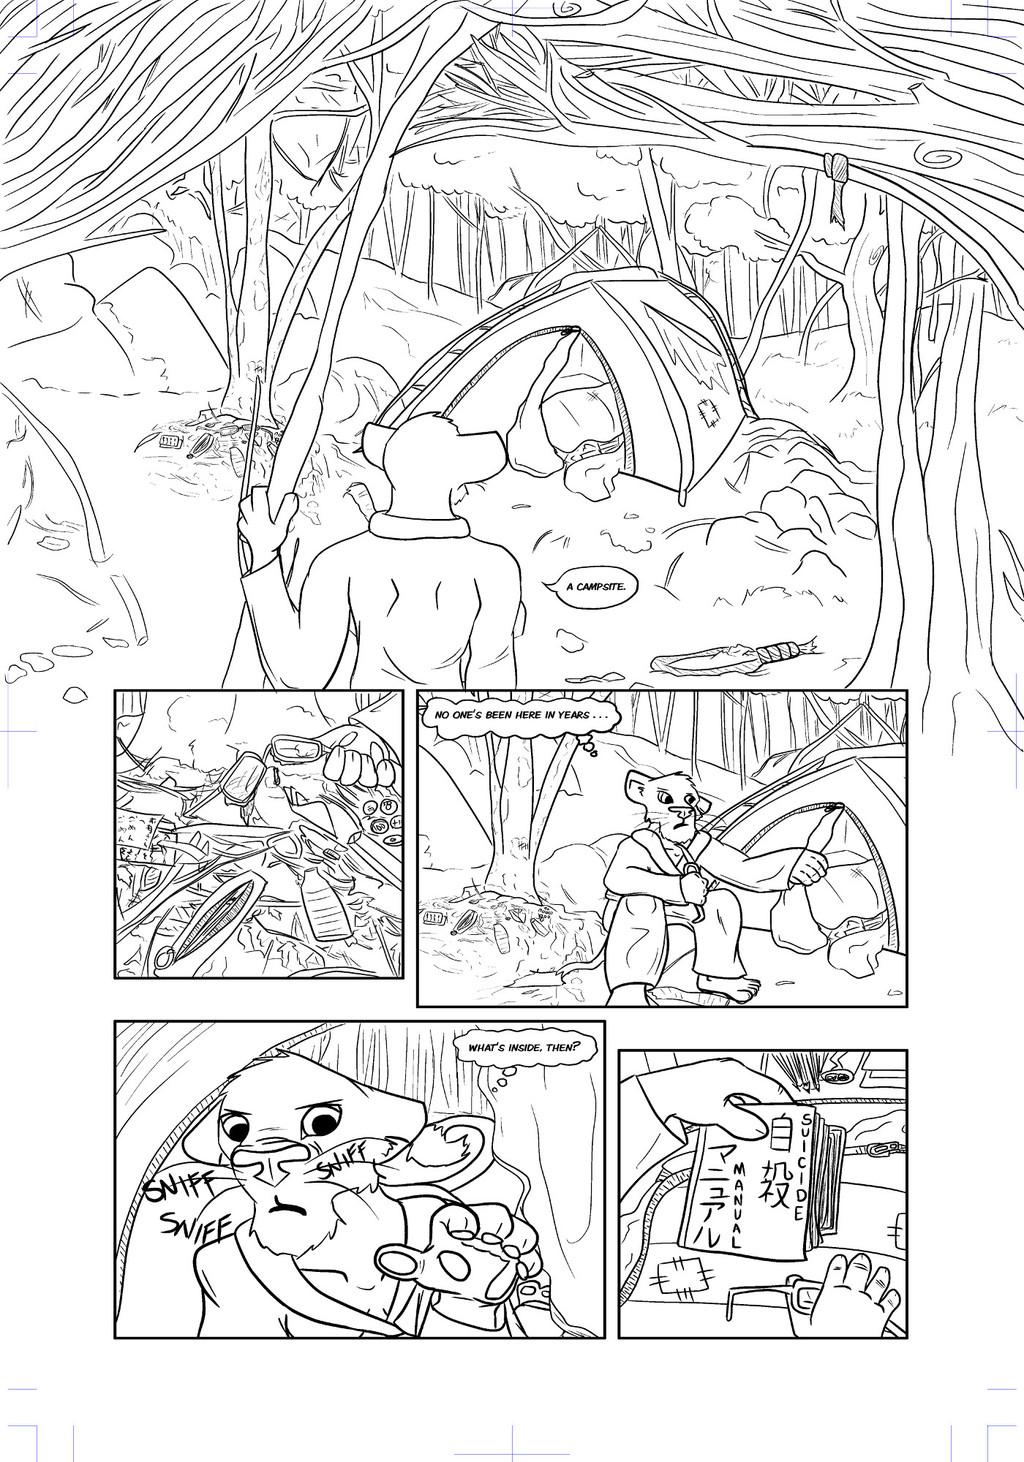 Comic: Sea of Trees, page 5